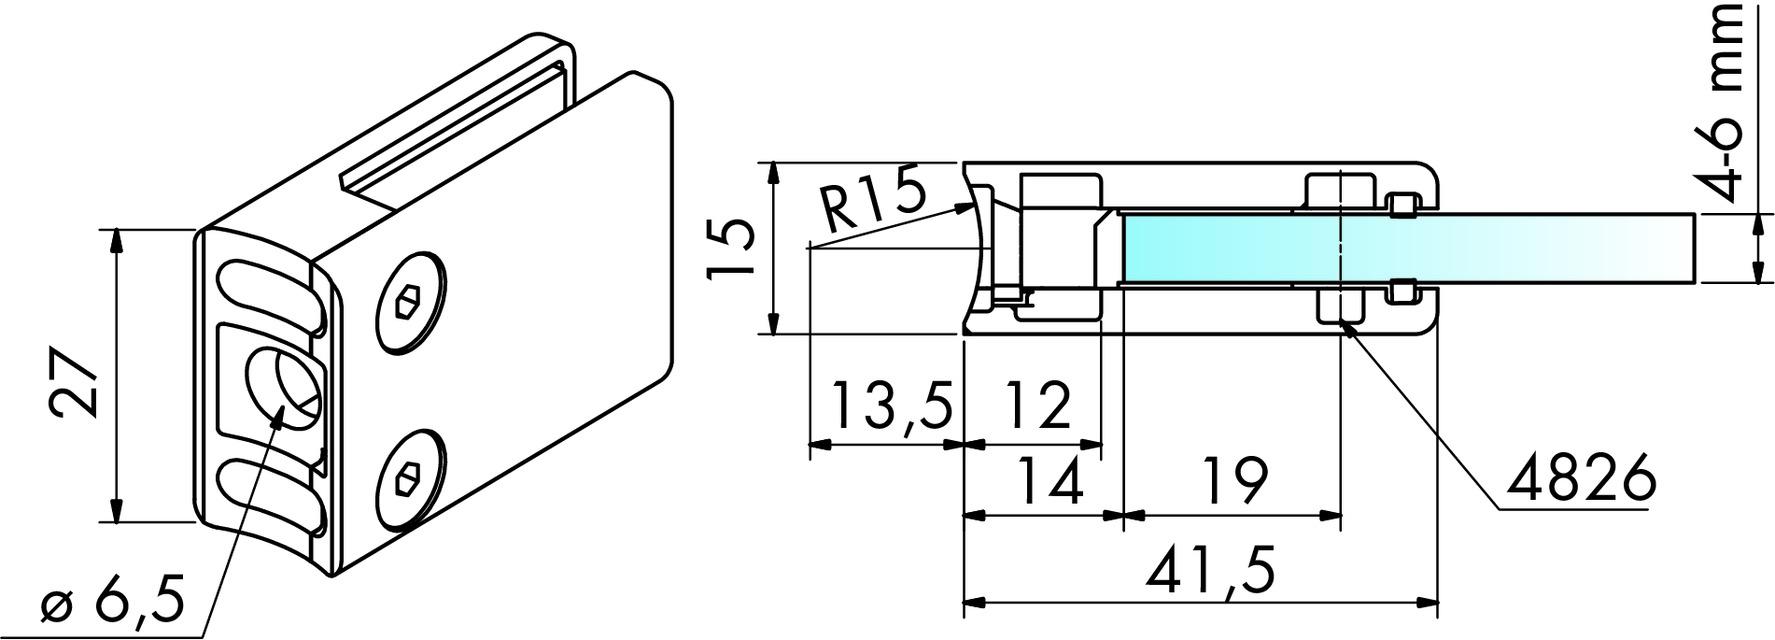 Glasklemmen Zink PAULI+SOHN 41.5/27 mm